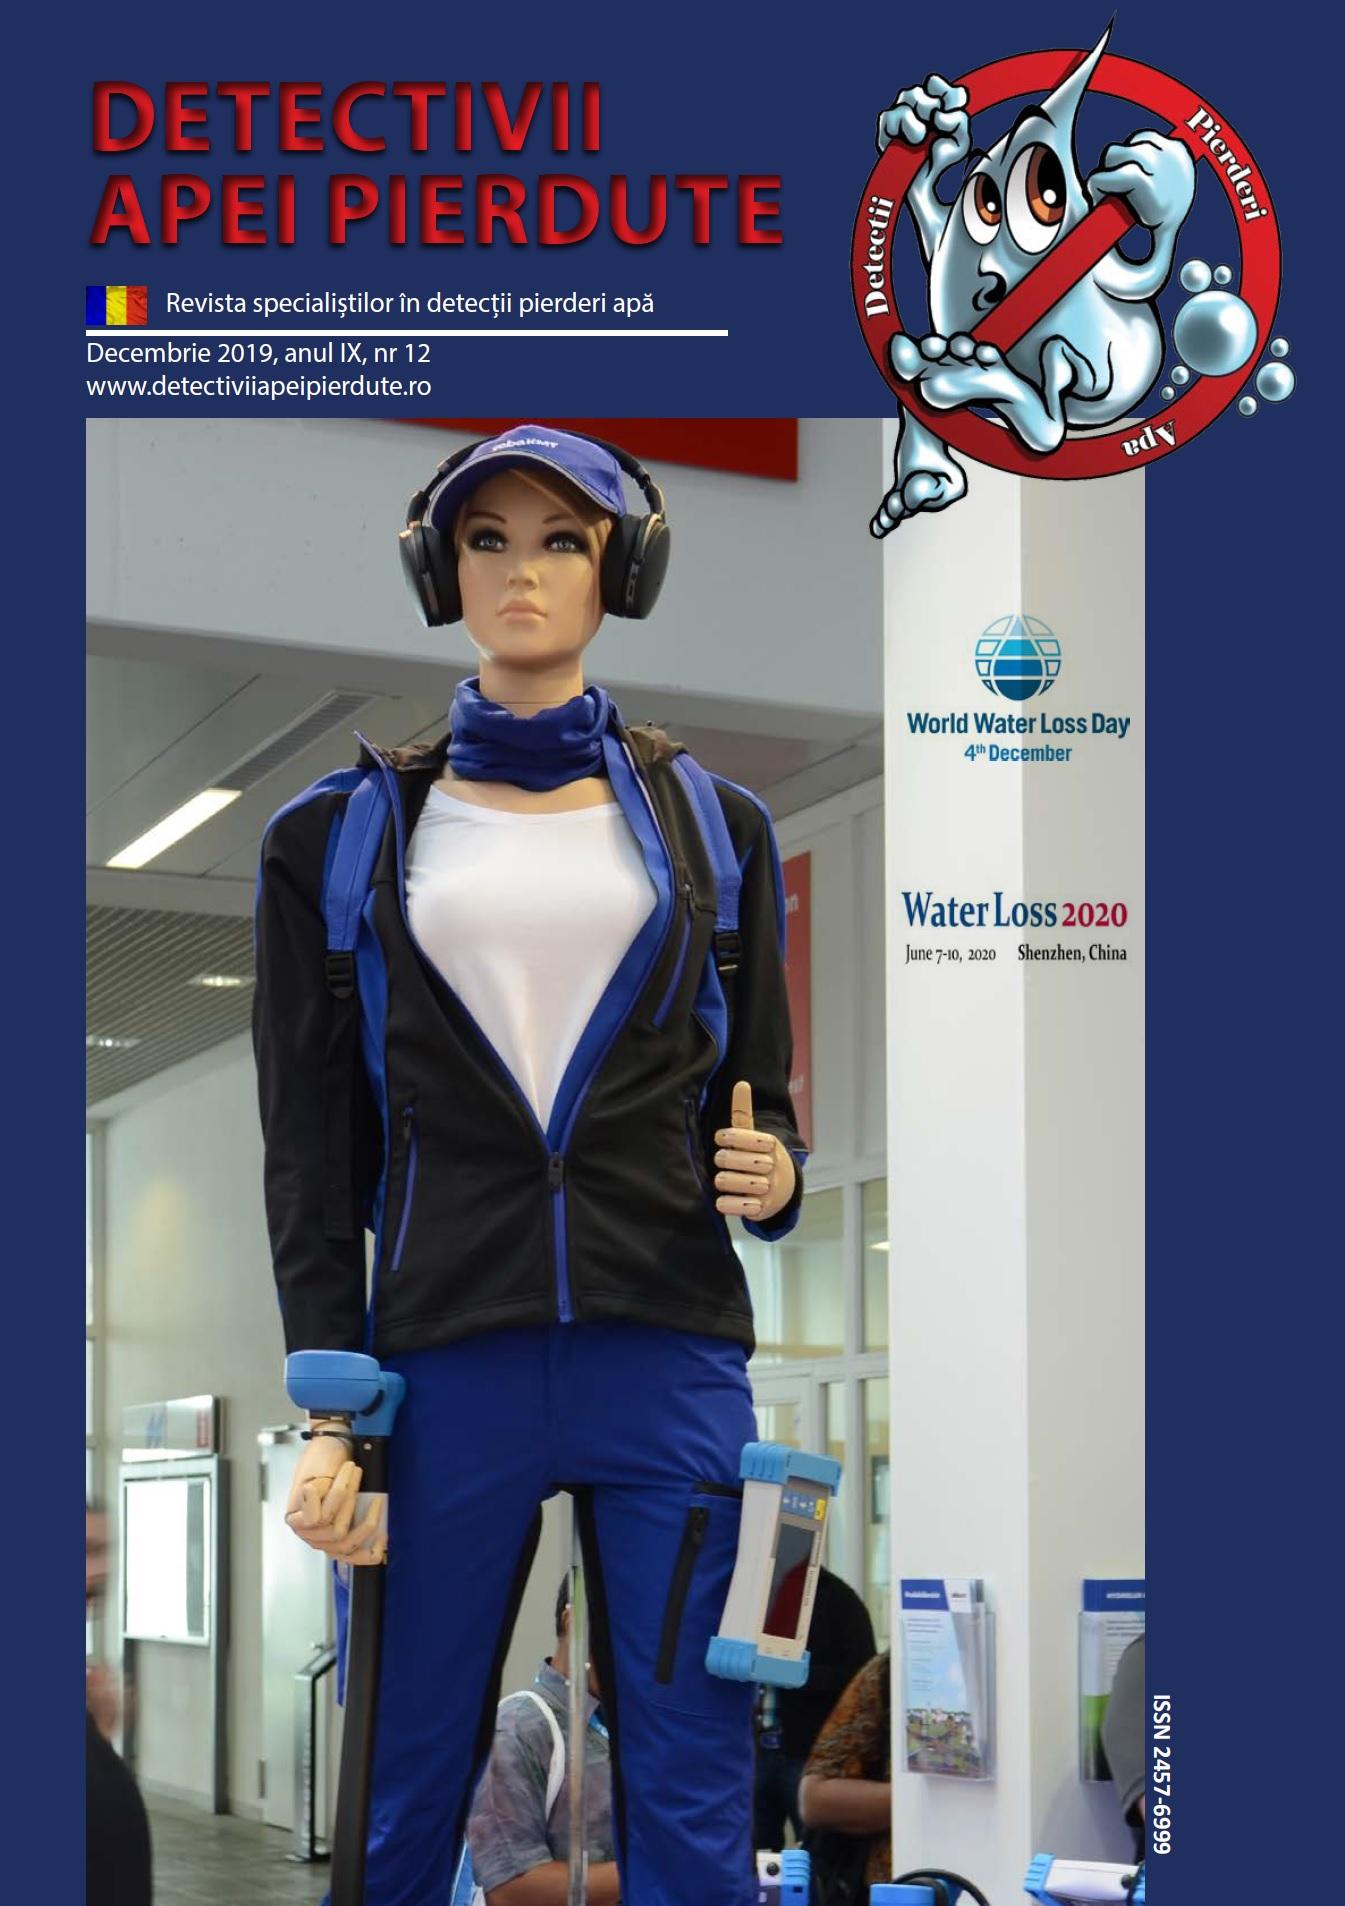 dematek-AML PRO - DETECTOR DE CONDUCTE DE PLASTIC INGROPATE in #12 din noiembrie 2019 al revistei